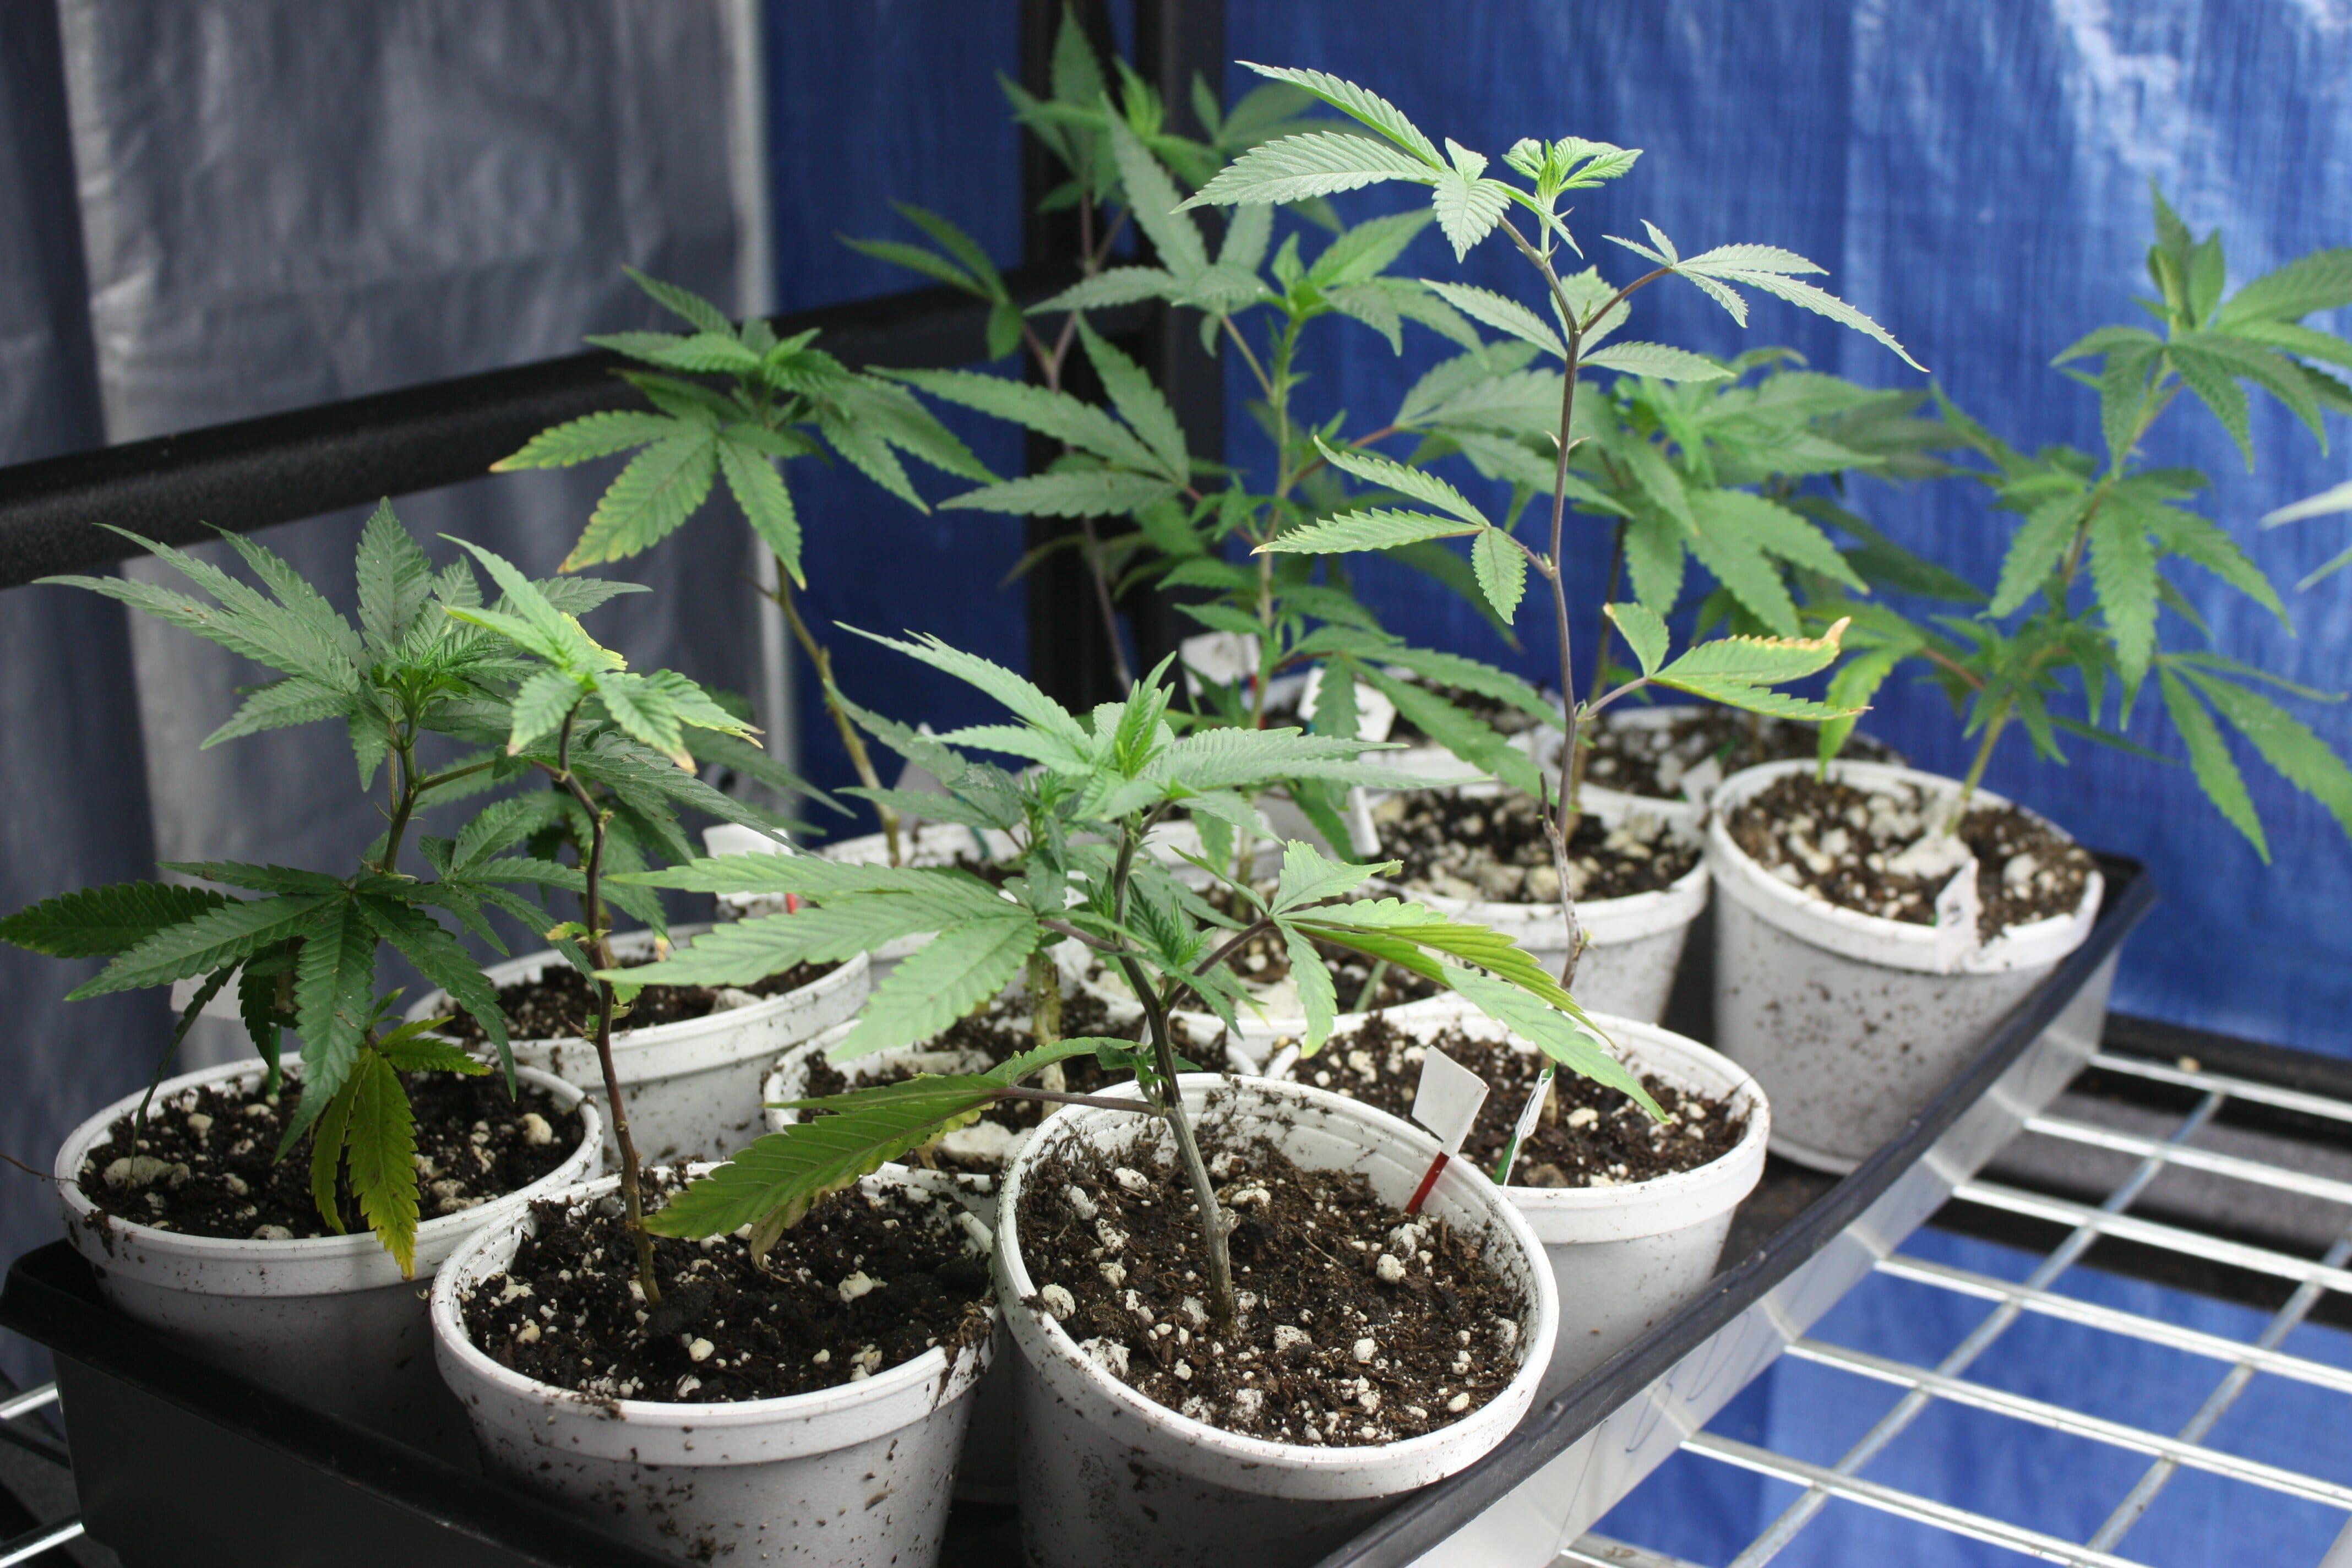 growing hemp at home